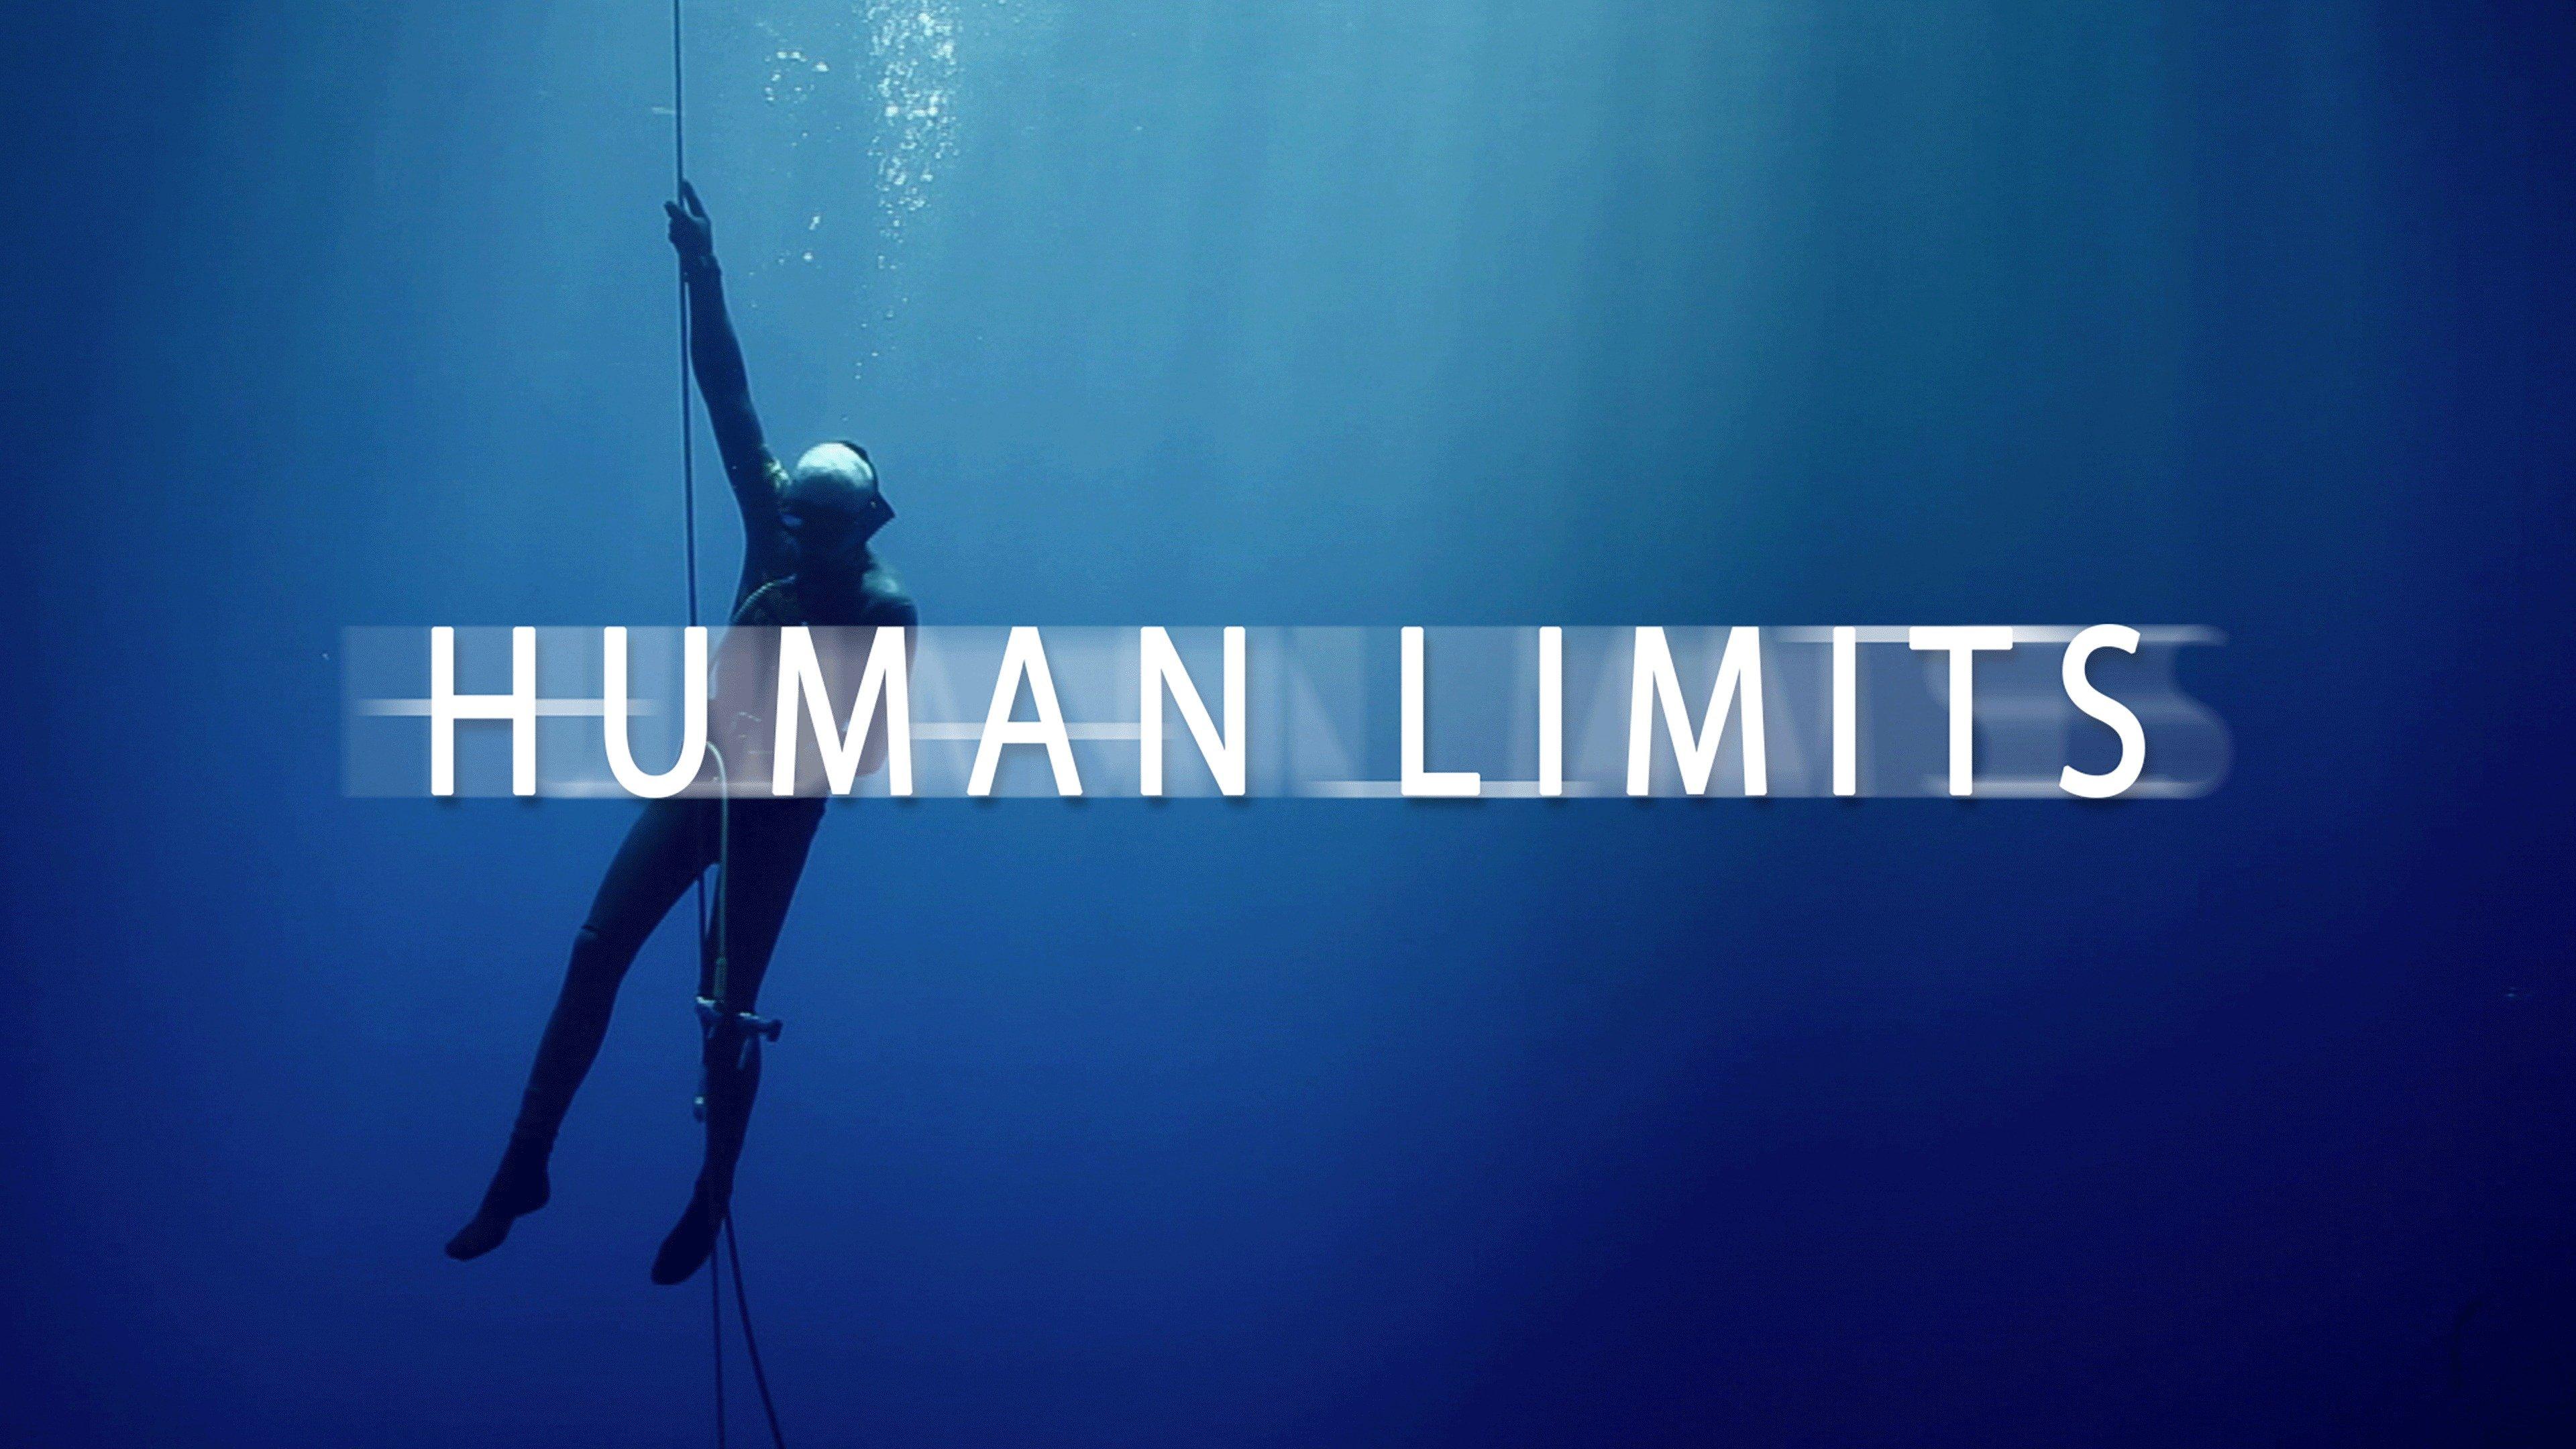 The Human Limits